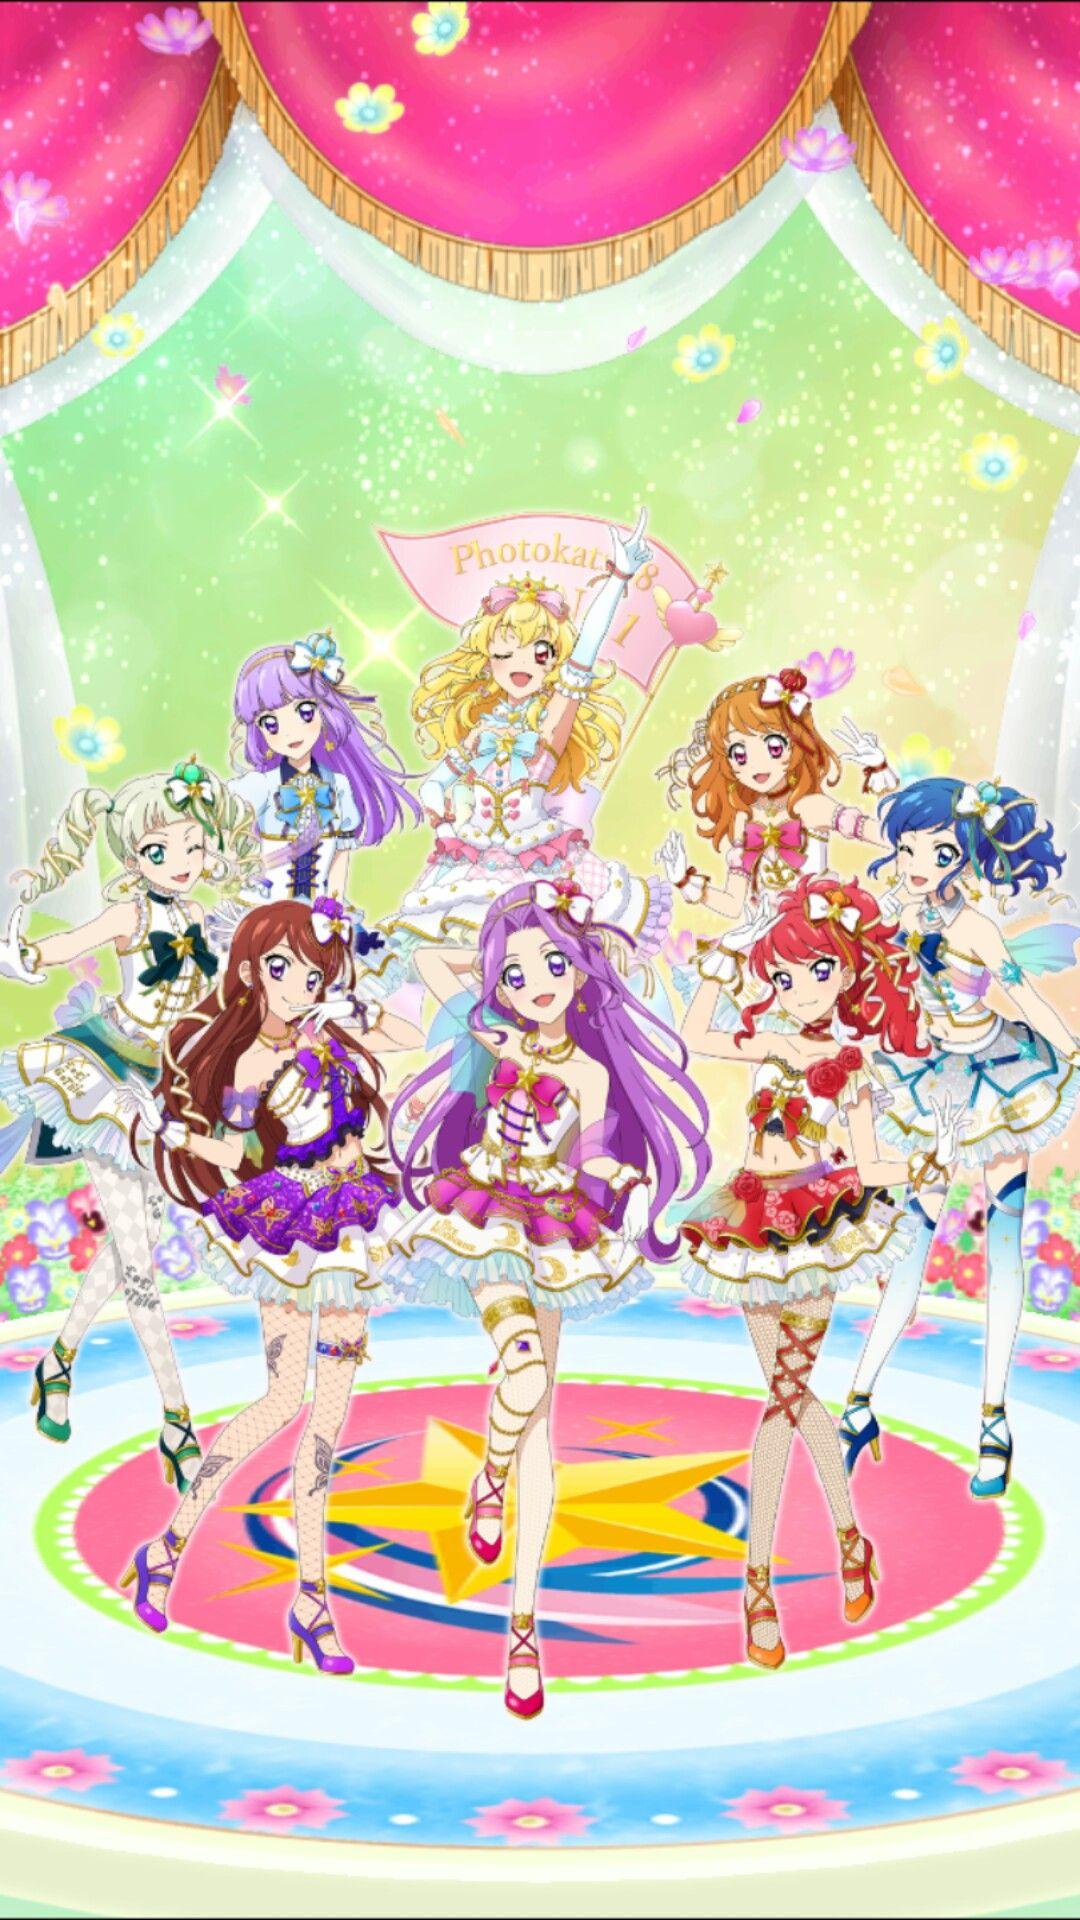 Photokatsu 8 Gadis Animasi Kartun Gambar Anime